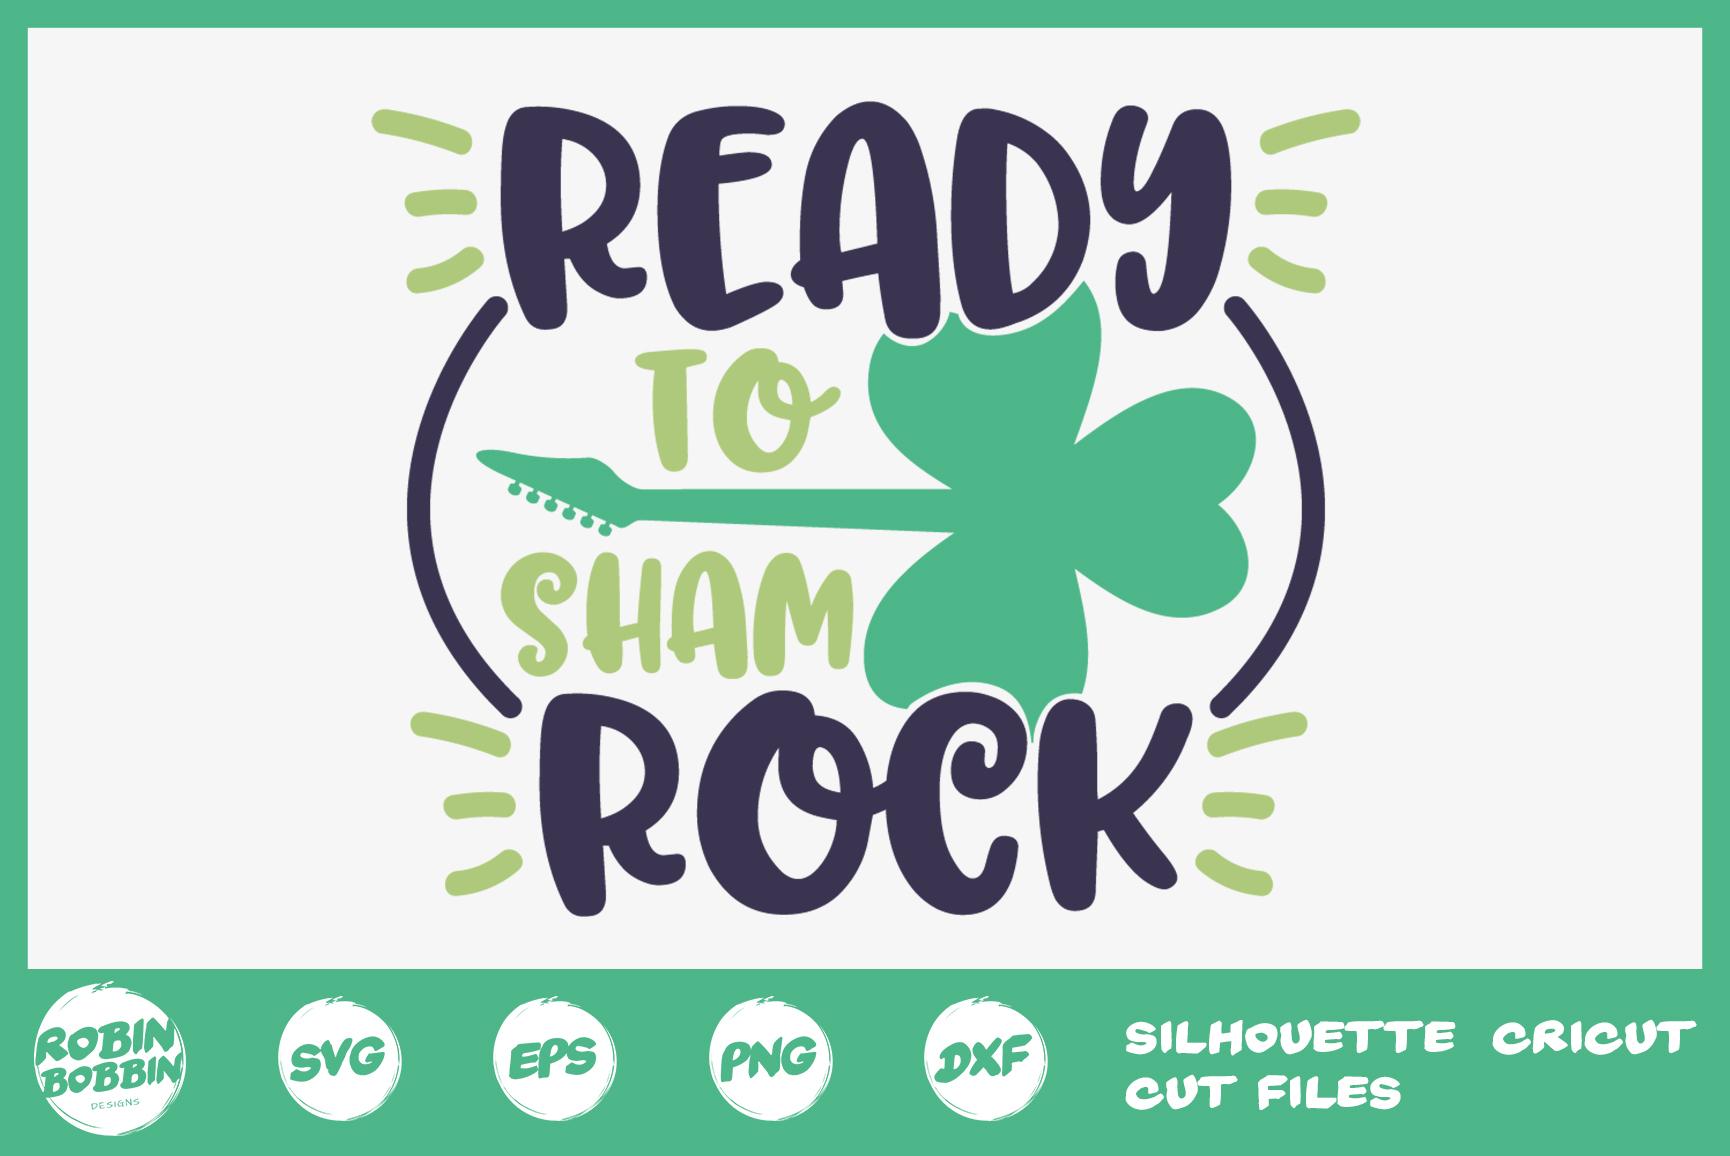 St. Patricks Day SVG, Ready To ShamRock SVG, Crafters SVG example image 1